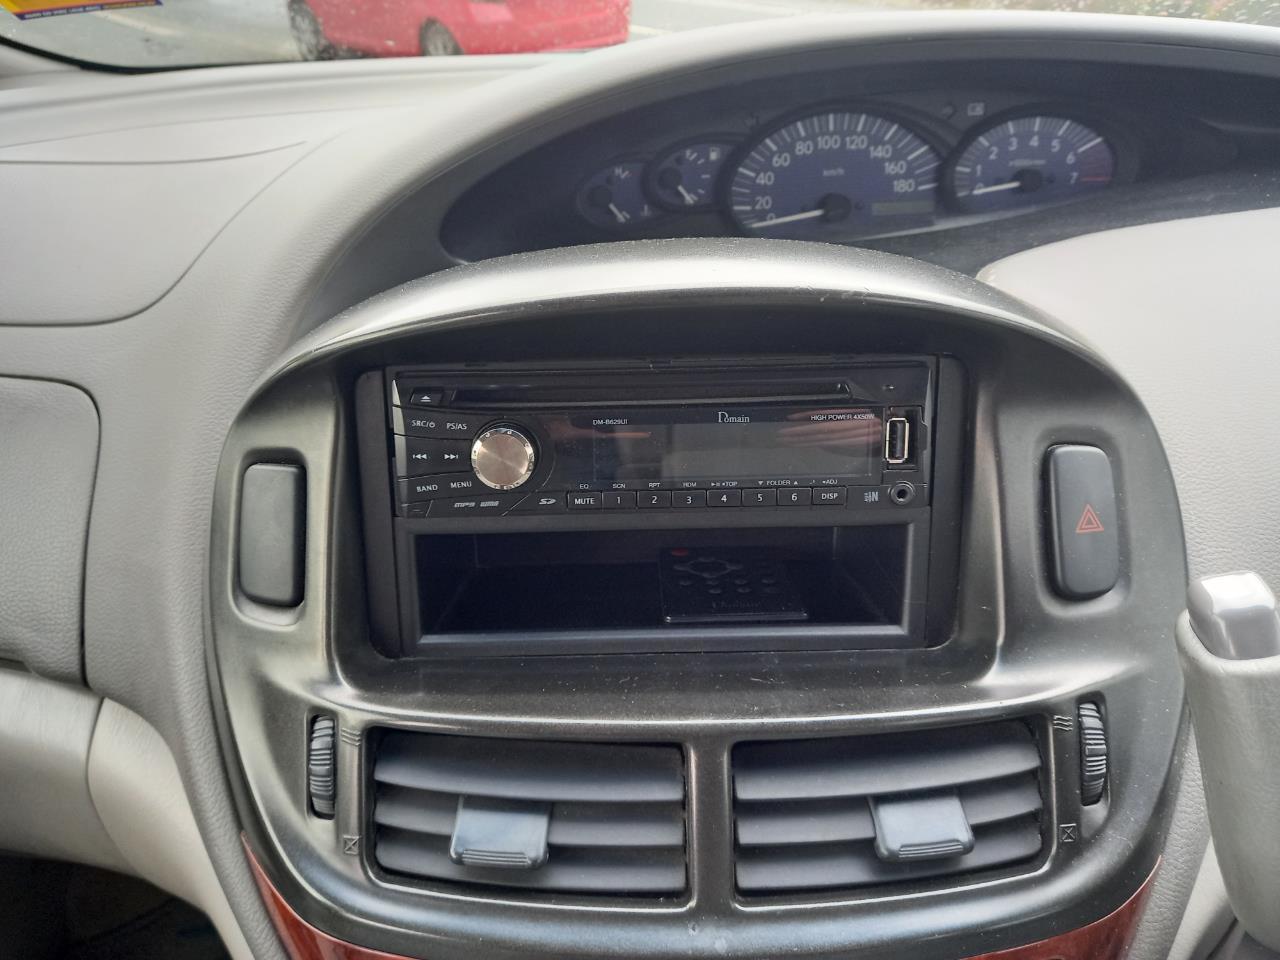 image-13, 2001 Toyota Estima 8 Seats No Deposit Finance at Dunedin